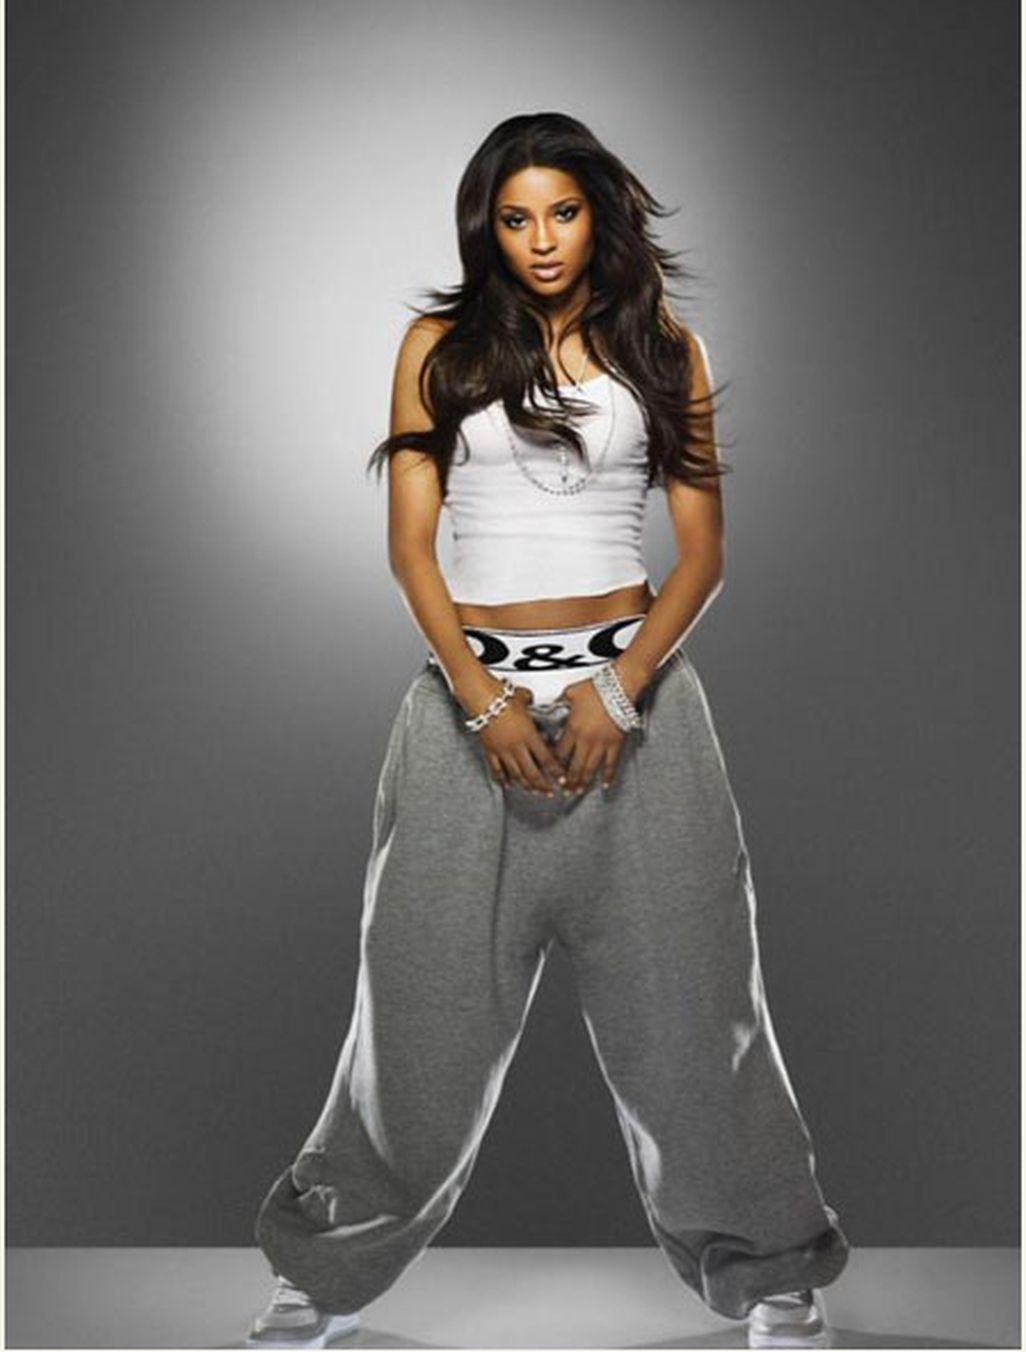 49 Fabulous Hip Hop Styles Clothing Ideas For Women | Hip